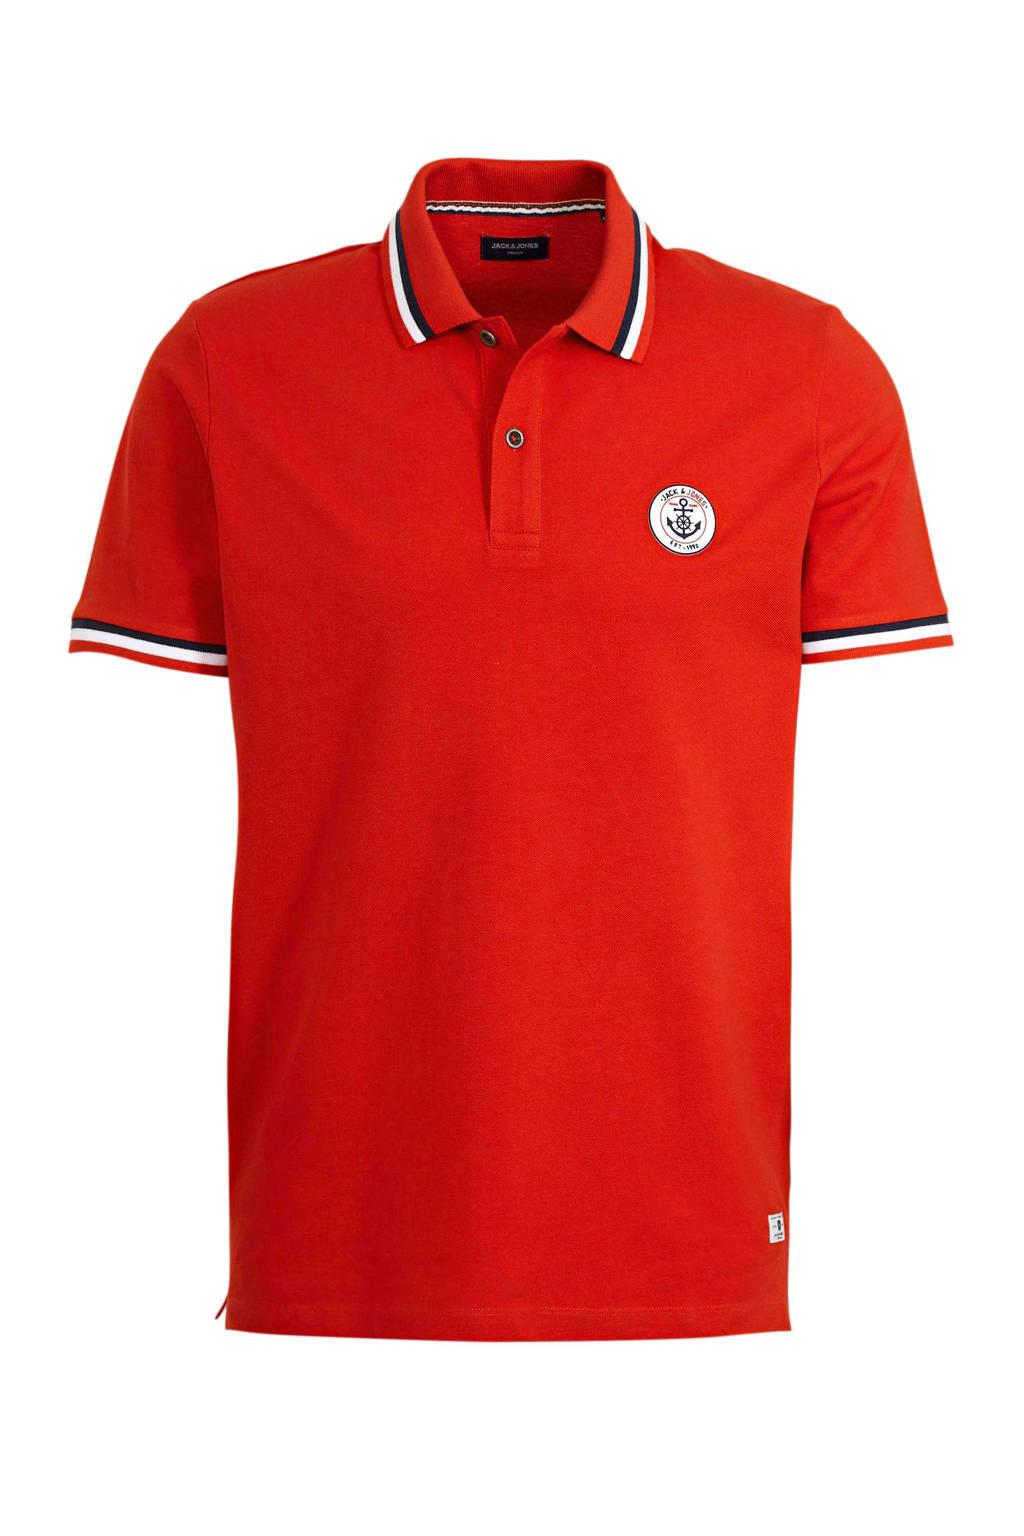 JACK & JONES PREMIUM slim fit polo met contrastbies rood, Rood